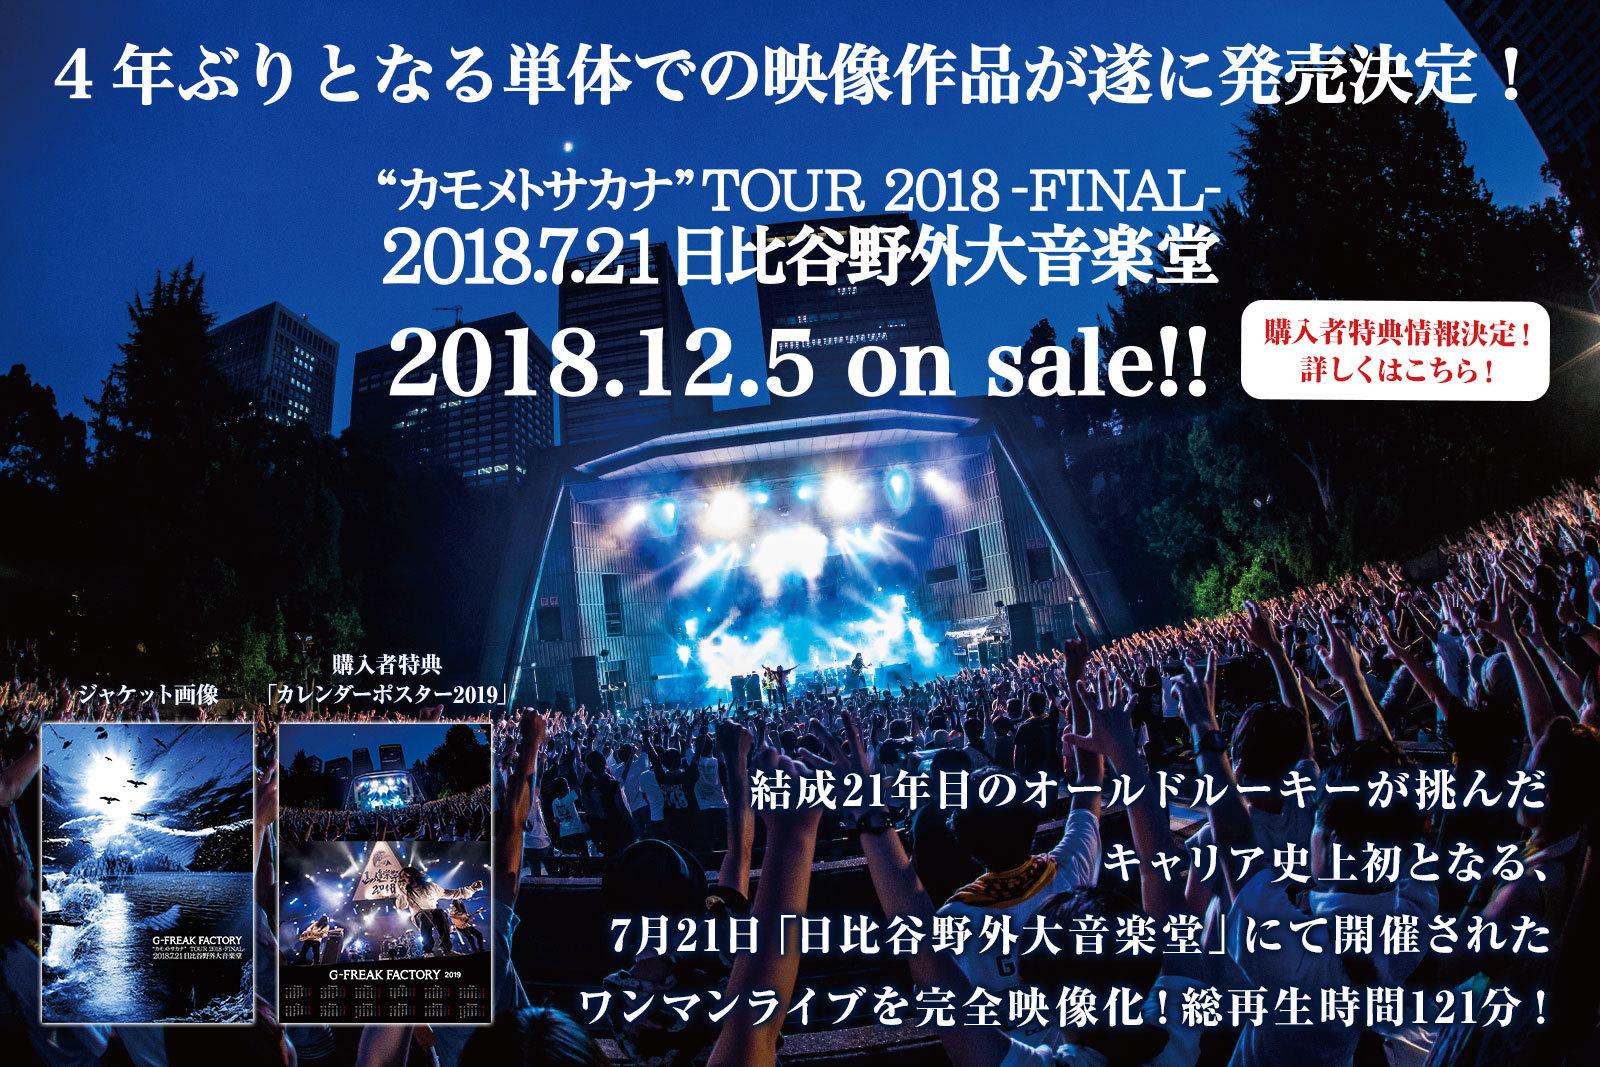 G-FREAK FACTORY 、12/5(水)ライブDVD発売決定!購入者特典情報決定!